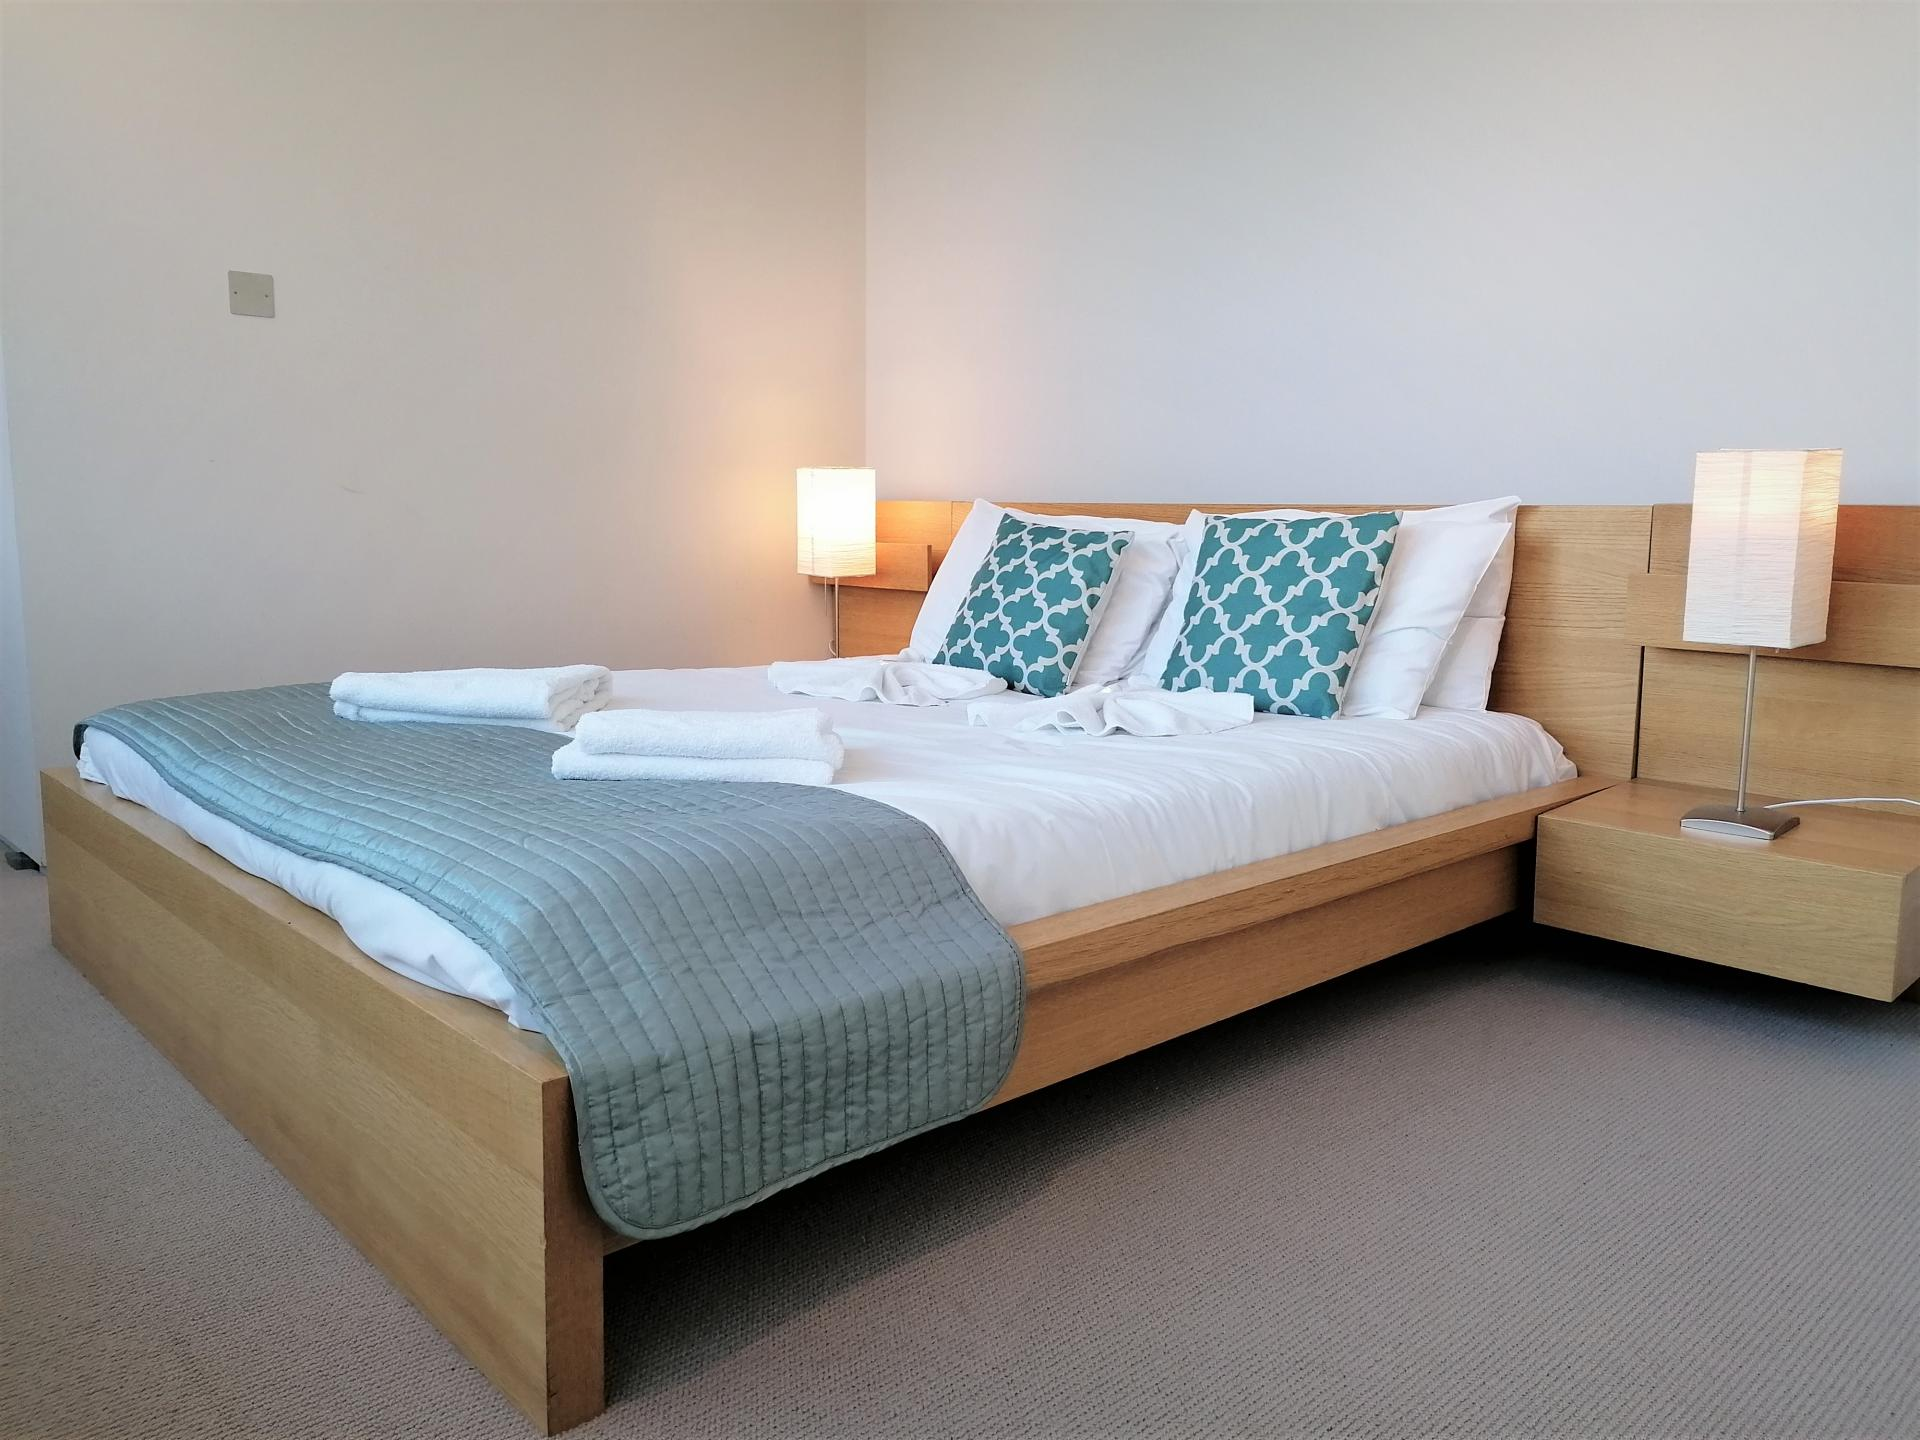 Bedroom atStill Life King's Cross Superior Apartment, Kings Cross St Pancras, London - Citybase Apartments